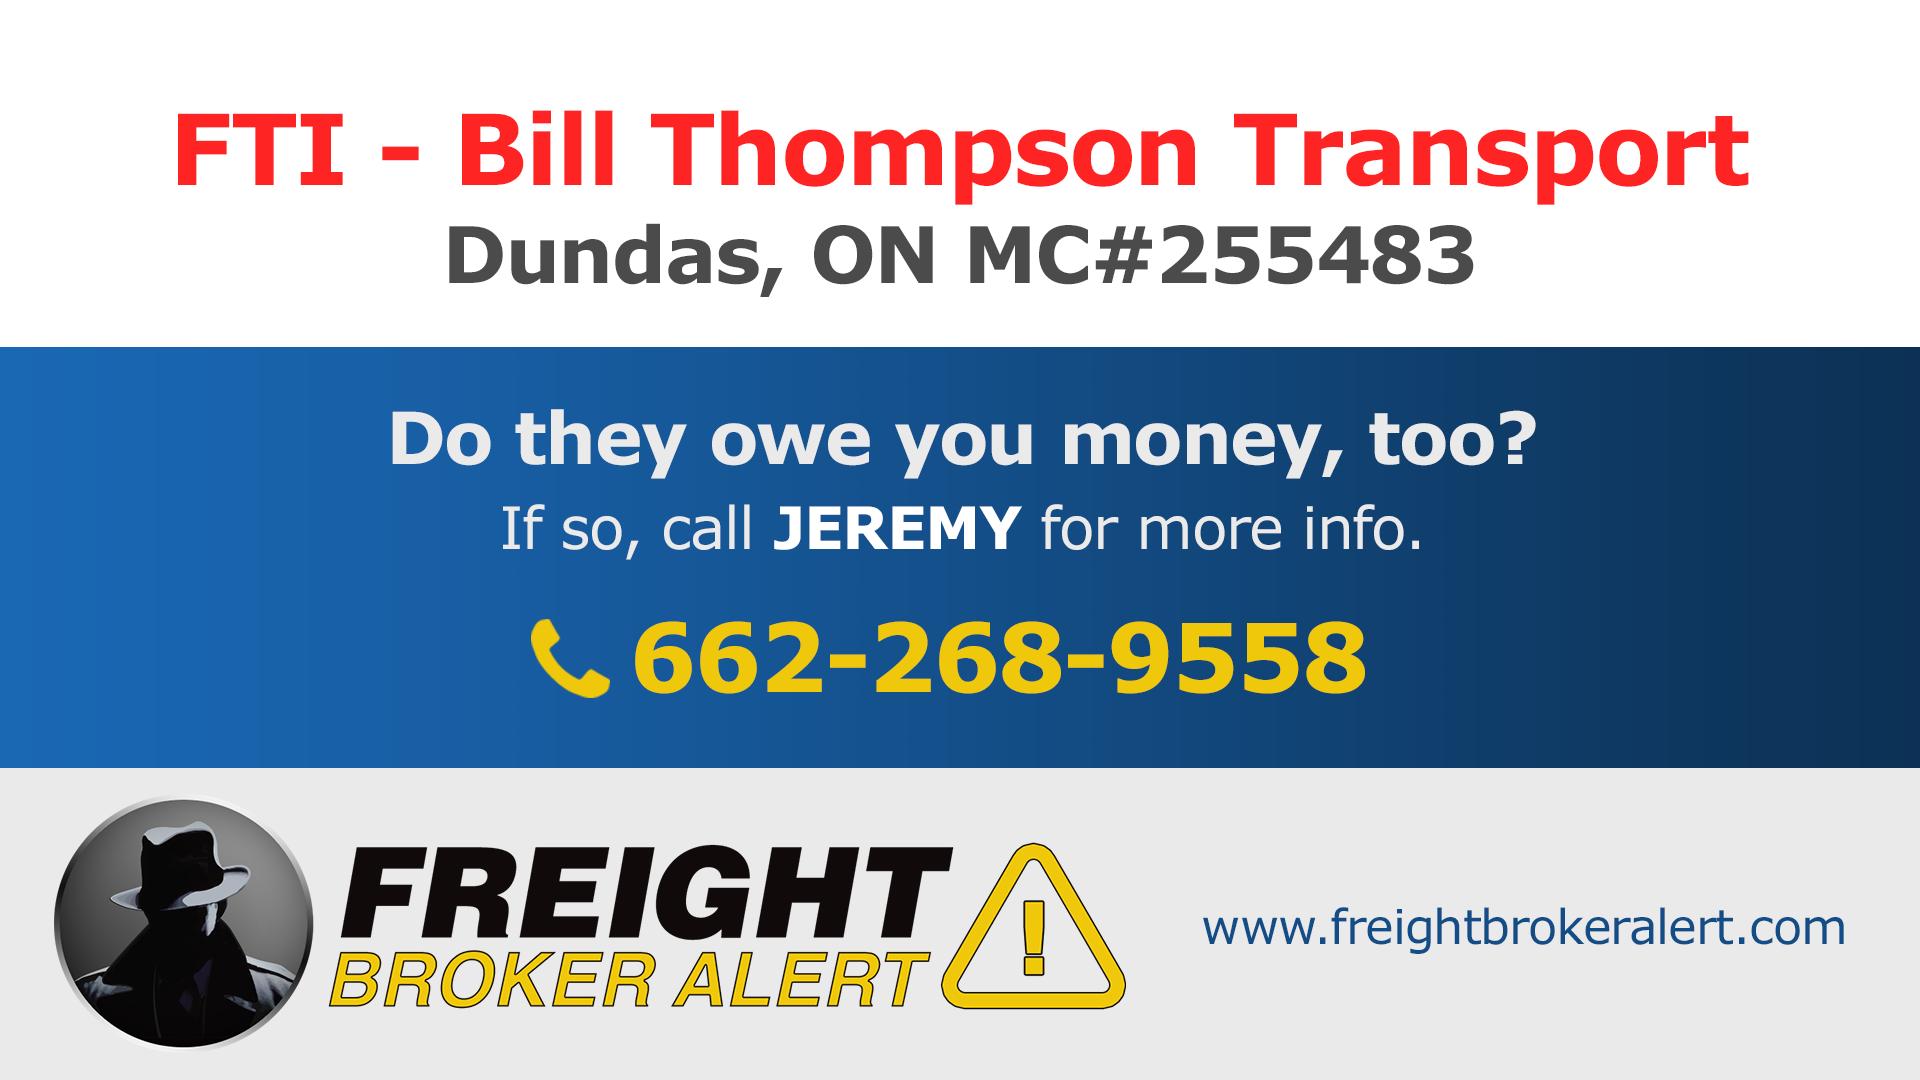 2810026 Canada Limited FTI Ontario